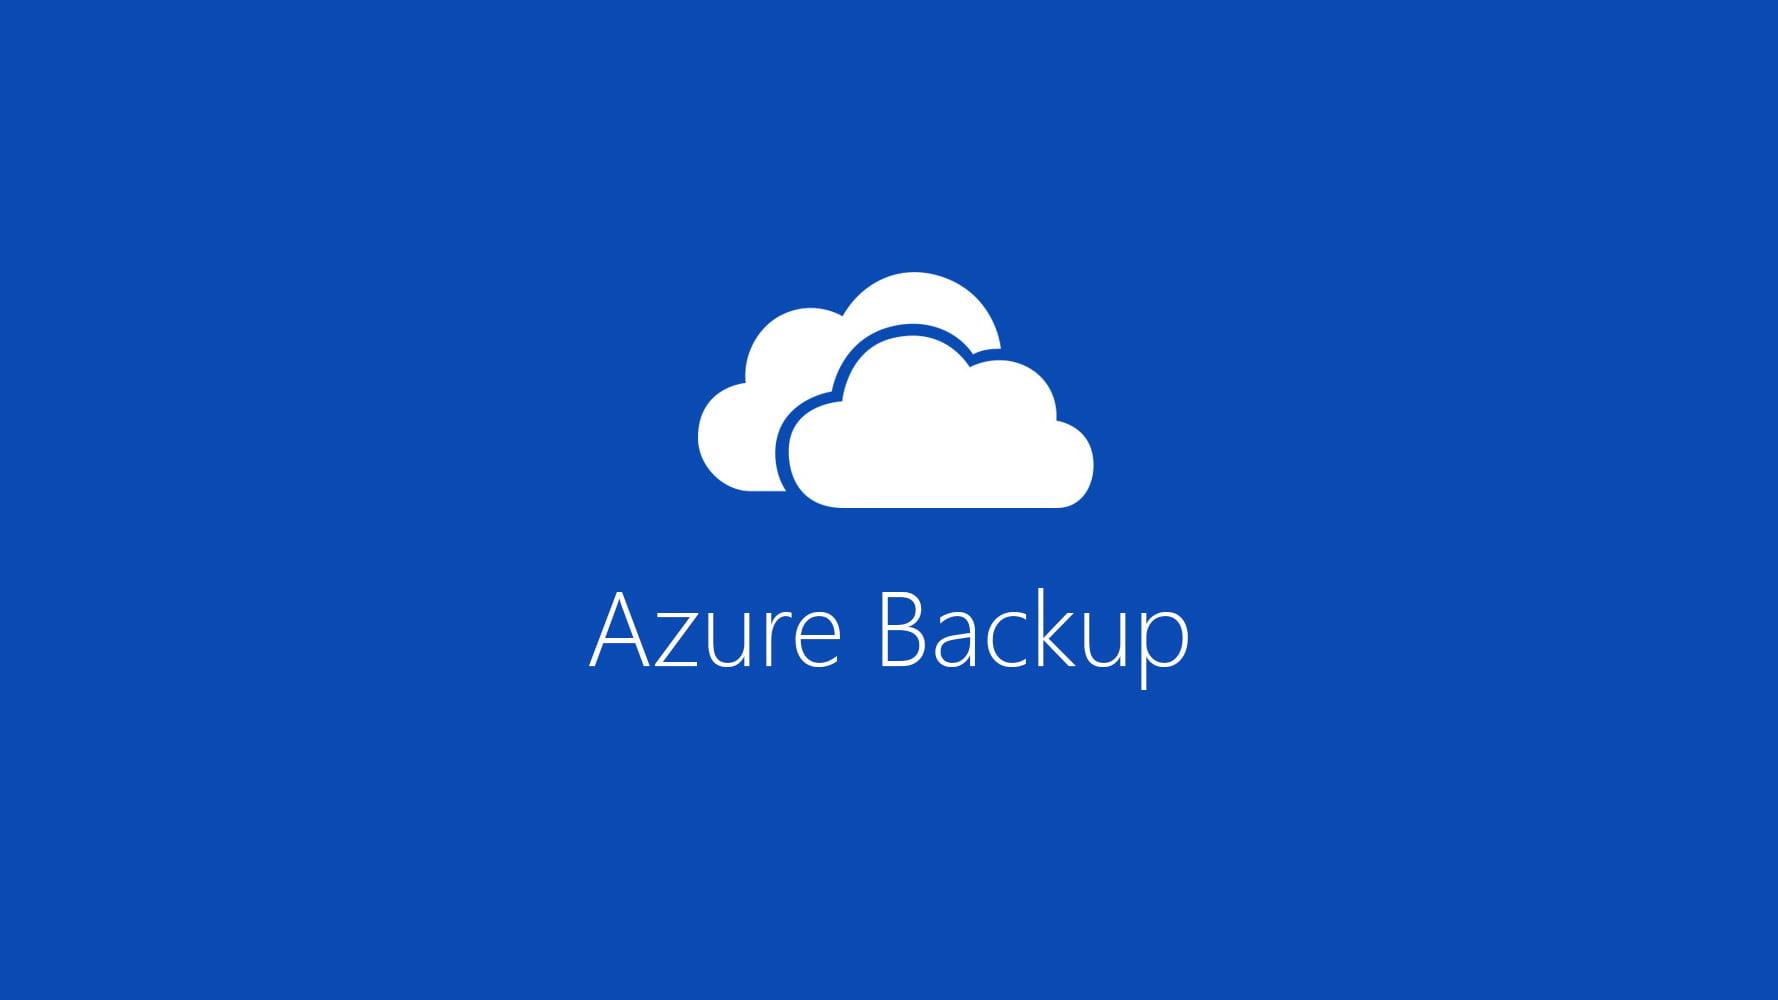 Usa Azure Backup con Windows 10